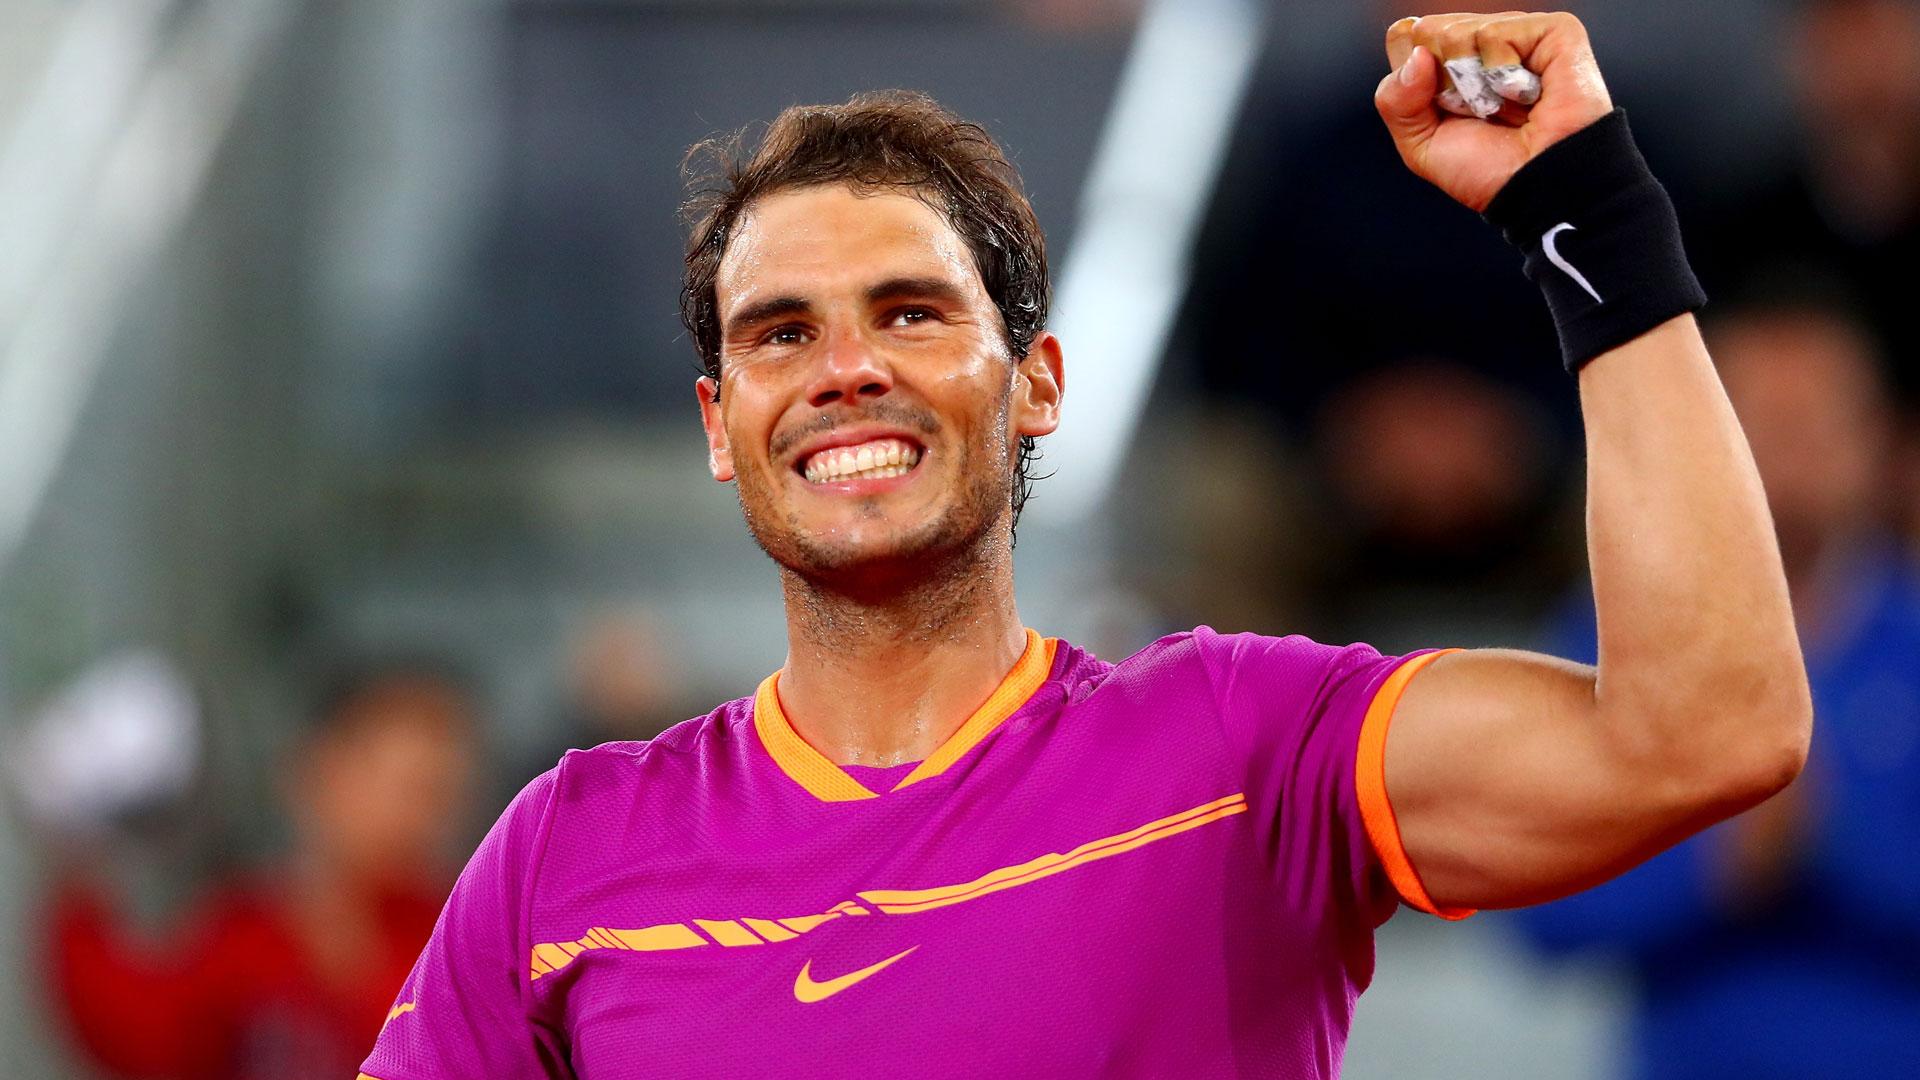 Roland Garros - Elle man 1 - Rafael Nadal - profile 3